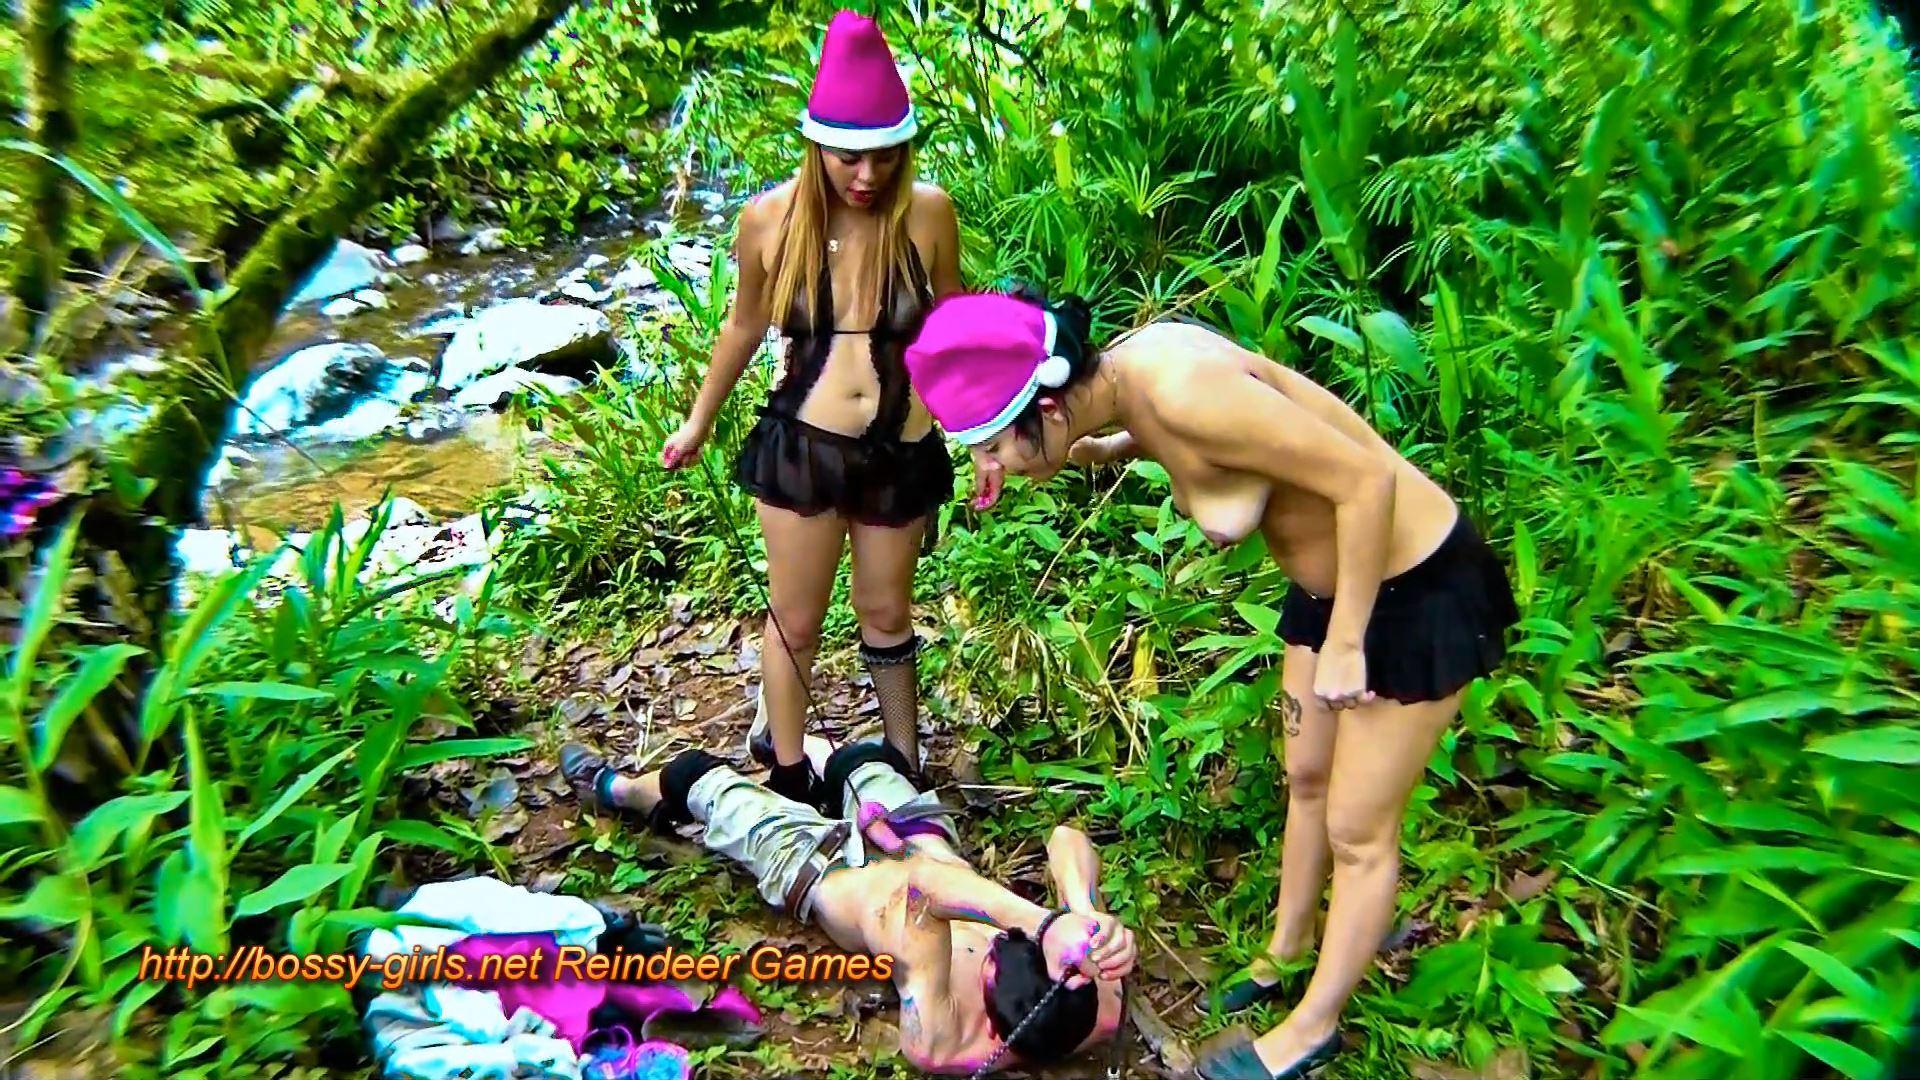 Jane Guerrero, Mlada, Worthless Scum In Scene: REINDEER GAMES 05 Limp Male Organ Stretch Gift - BOSSY-GIRLS - FULL HD/1080p/MP4